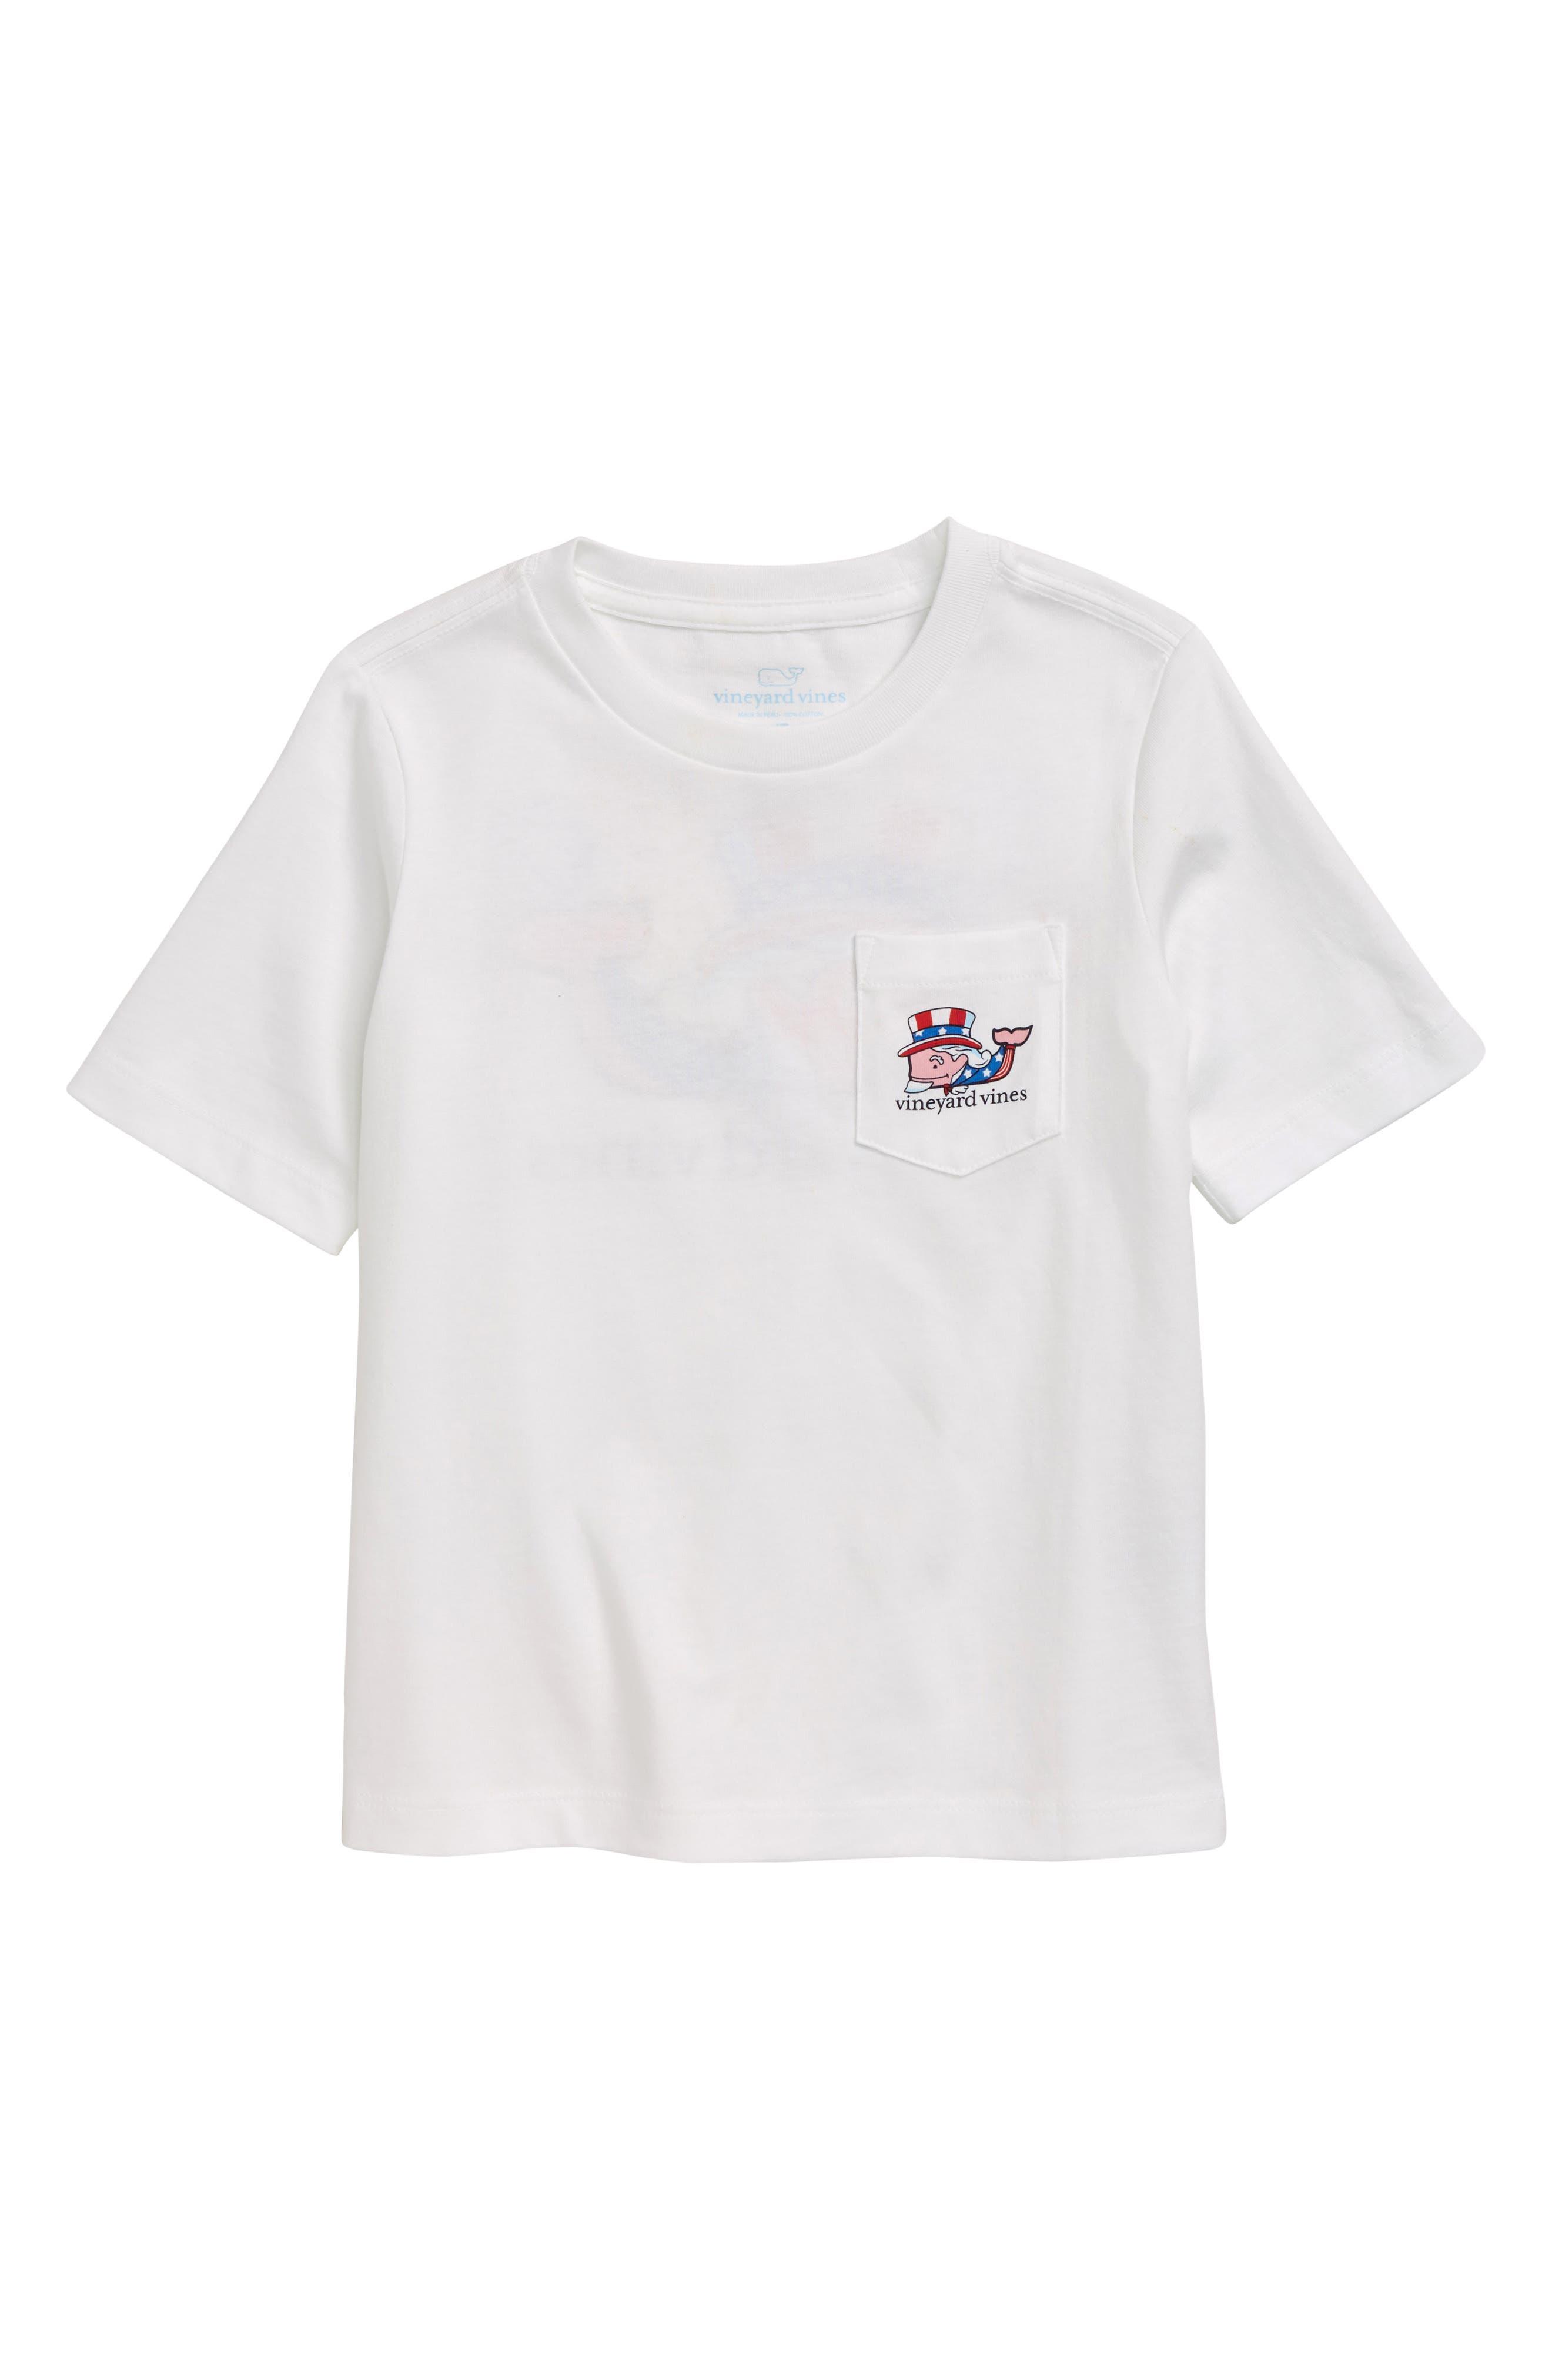 Toddler Boys Vineyard Vines Uncle Sam Whale Pocket TShirt Size 4T  White